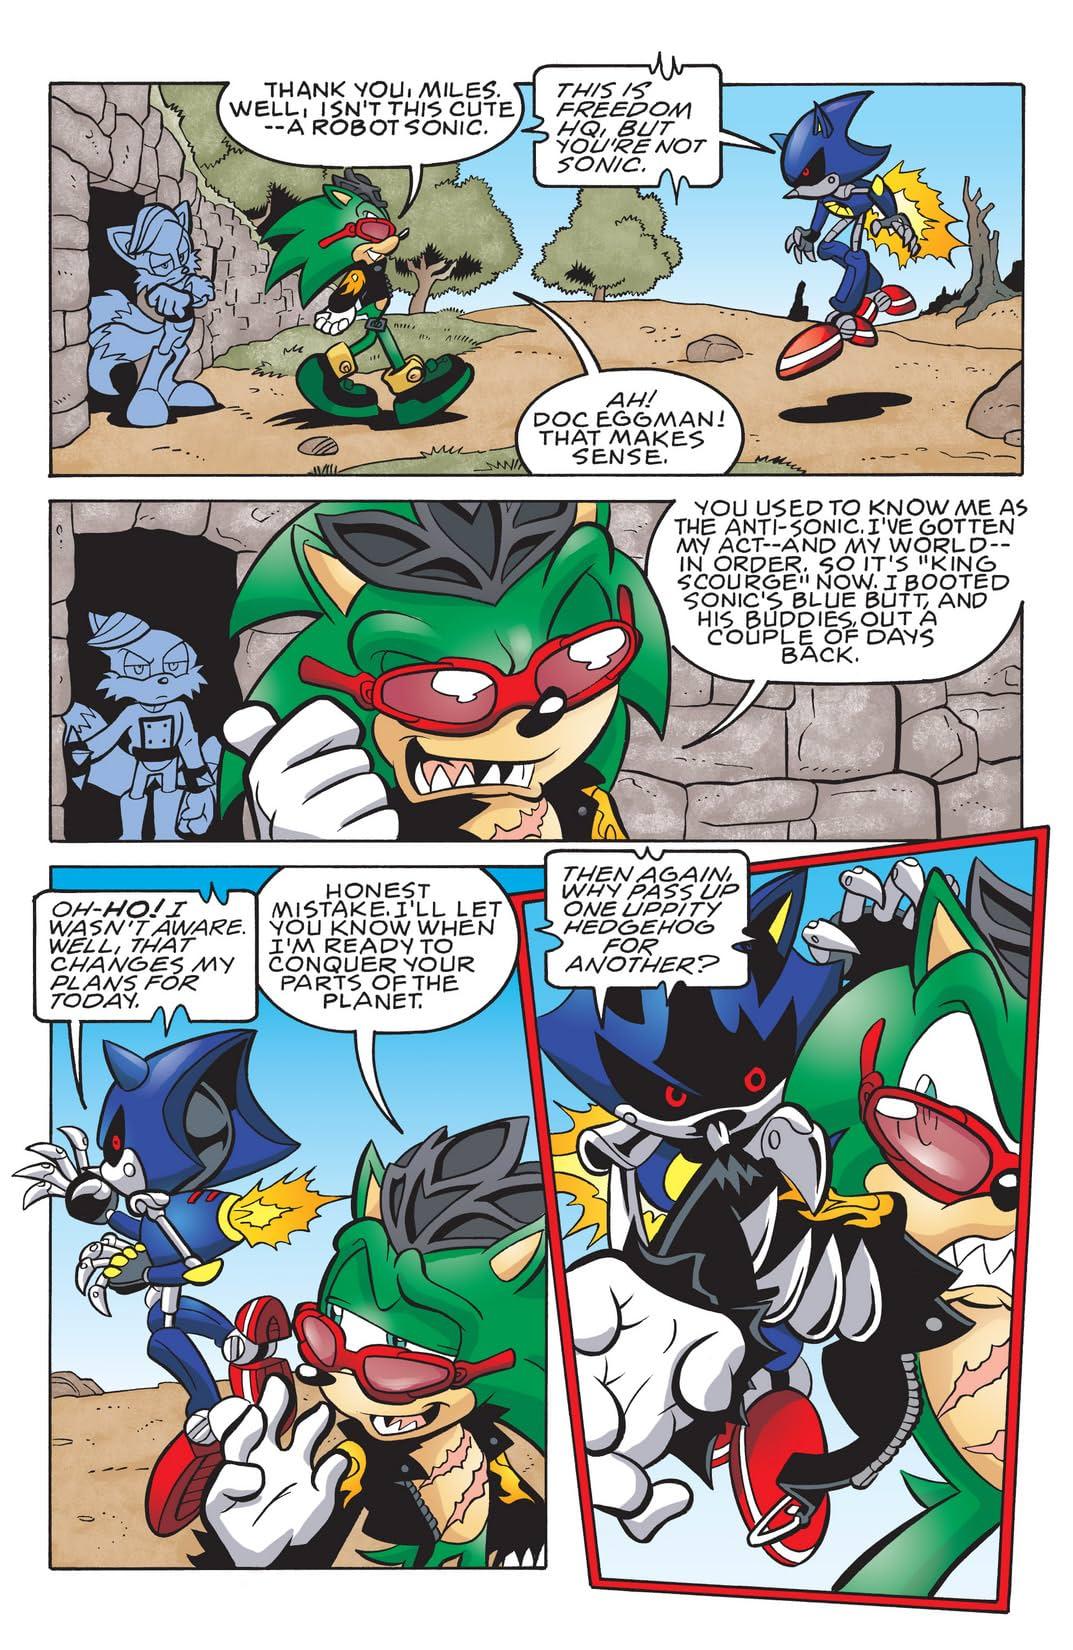 Sonic the Hedgehog #191